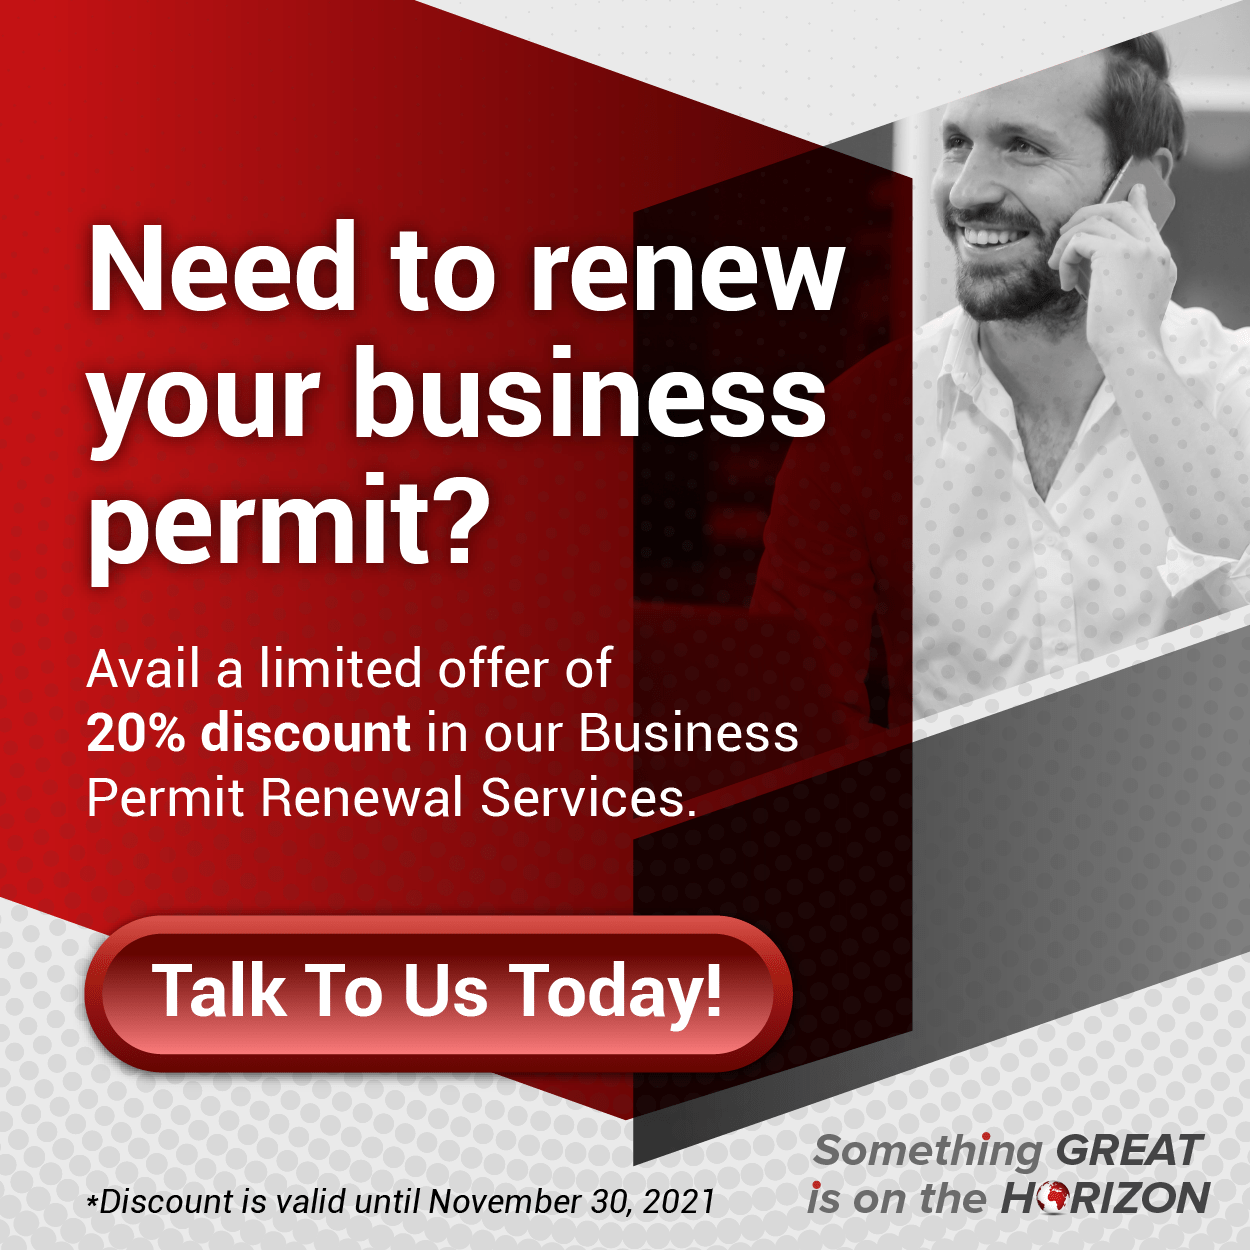 Business Permit Renewal